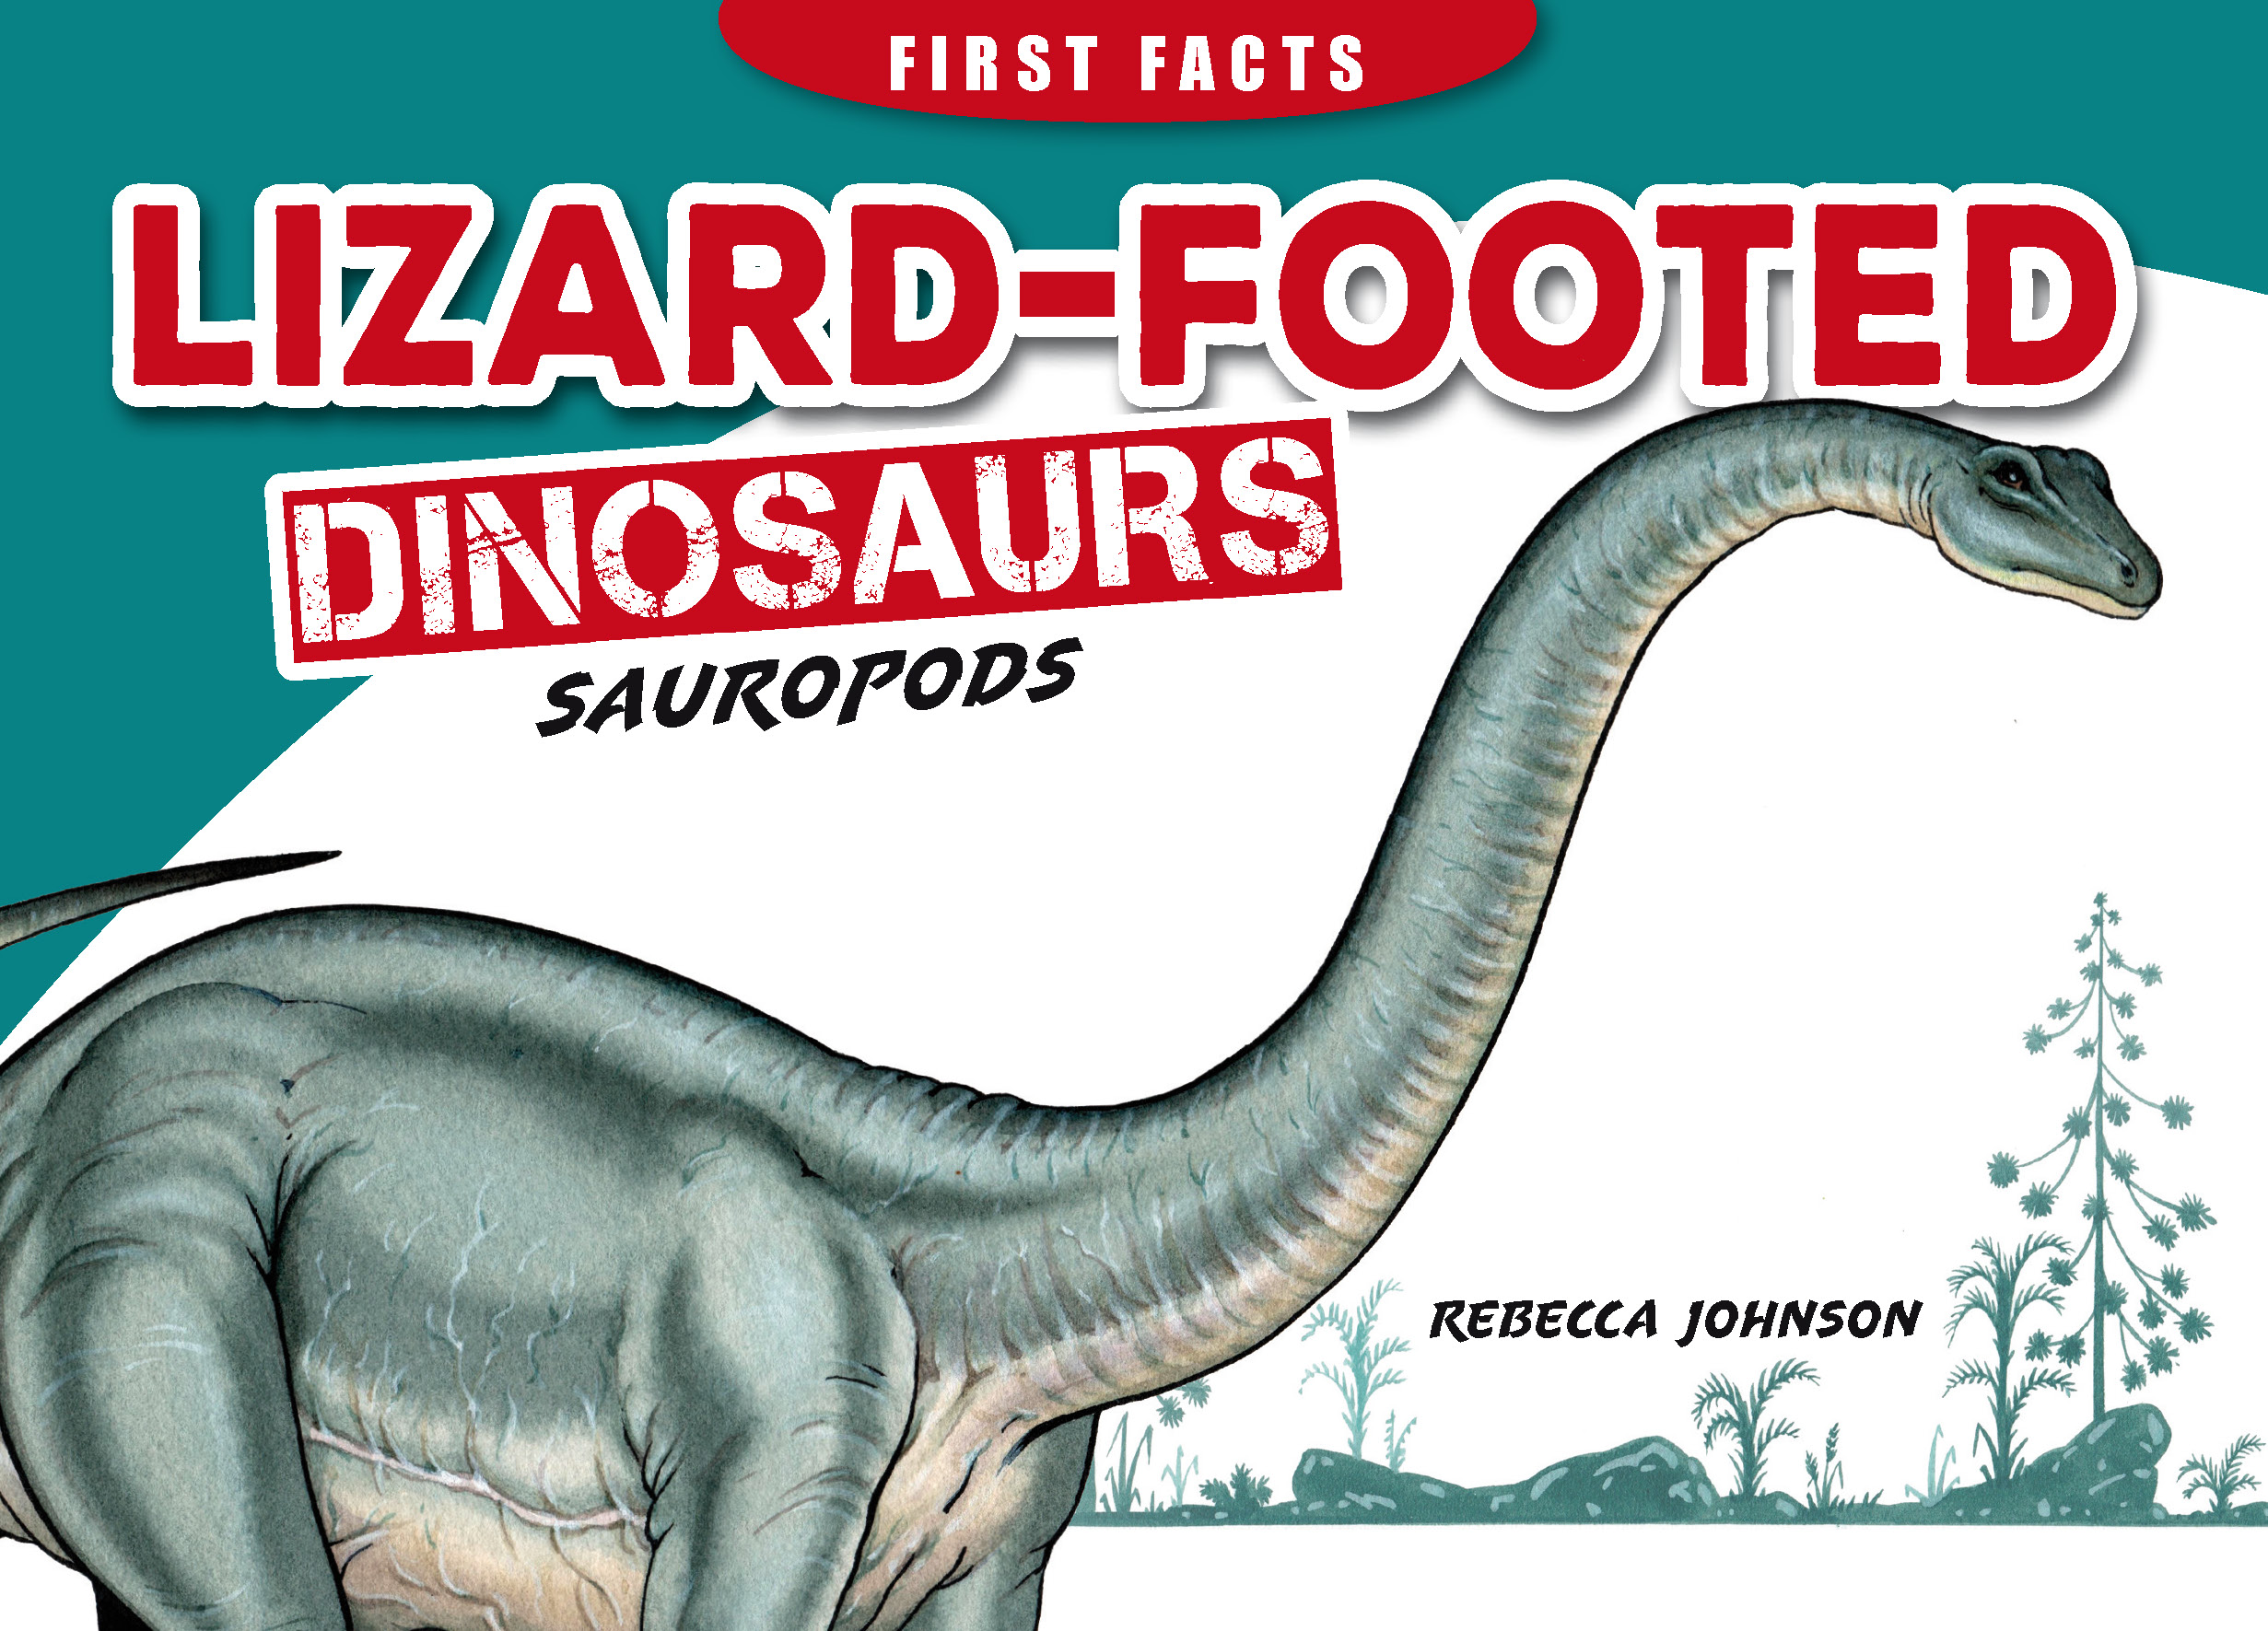 Steve Parish First Facts Dinosaurs: Lizard-footed dinosaurs - Sauropods